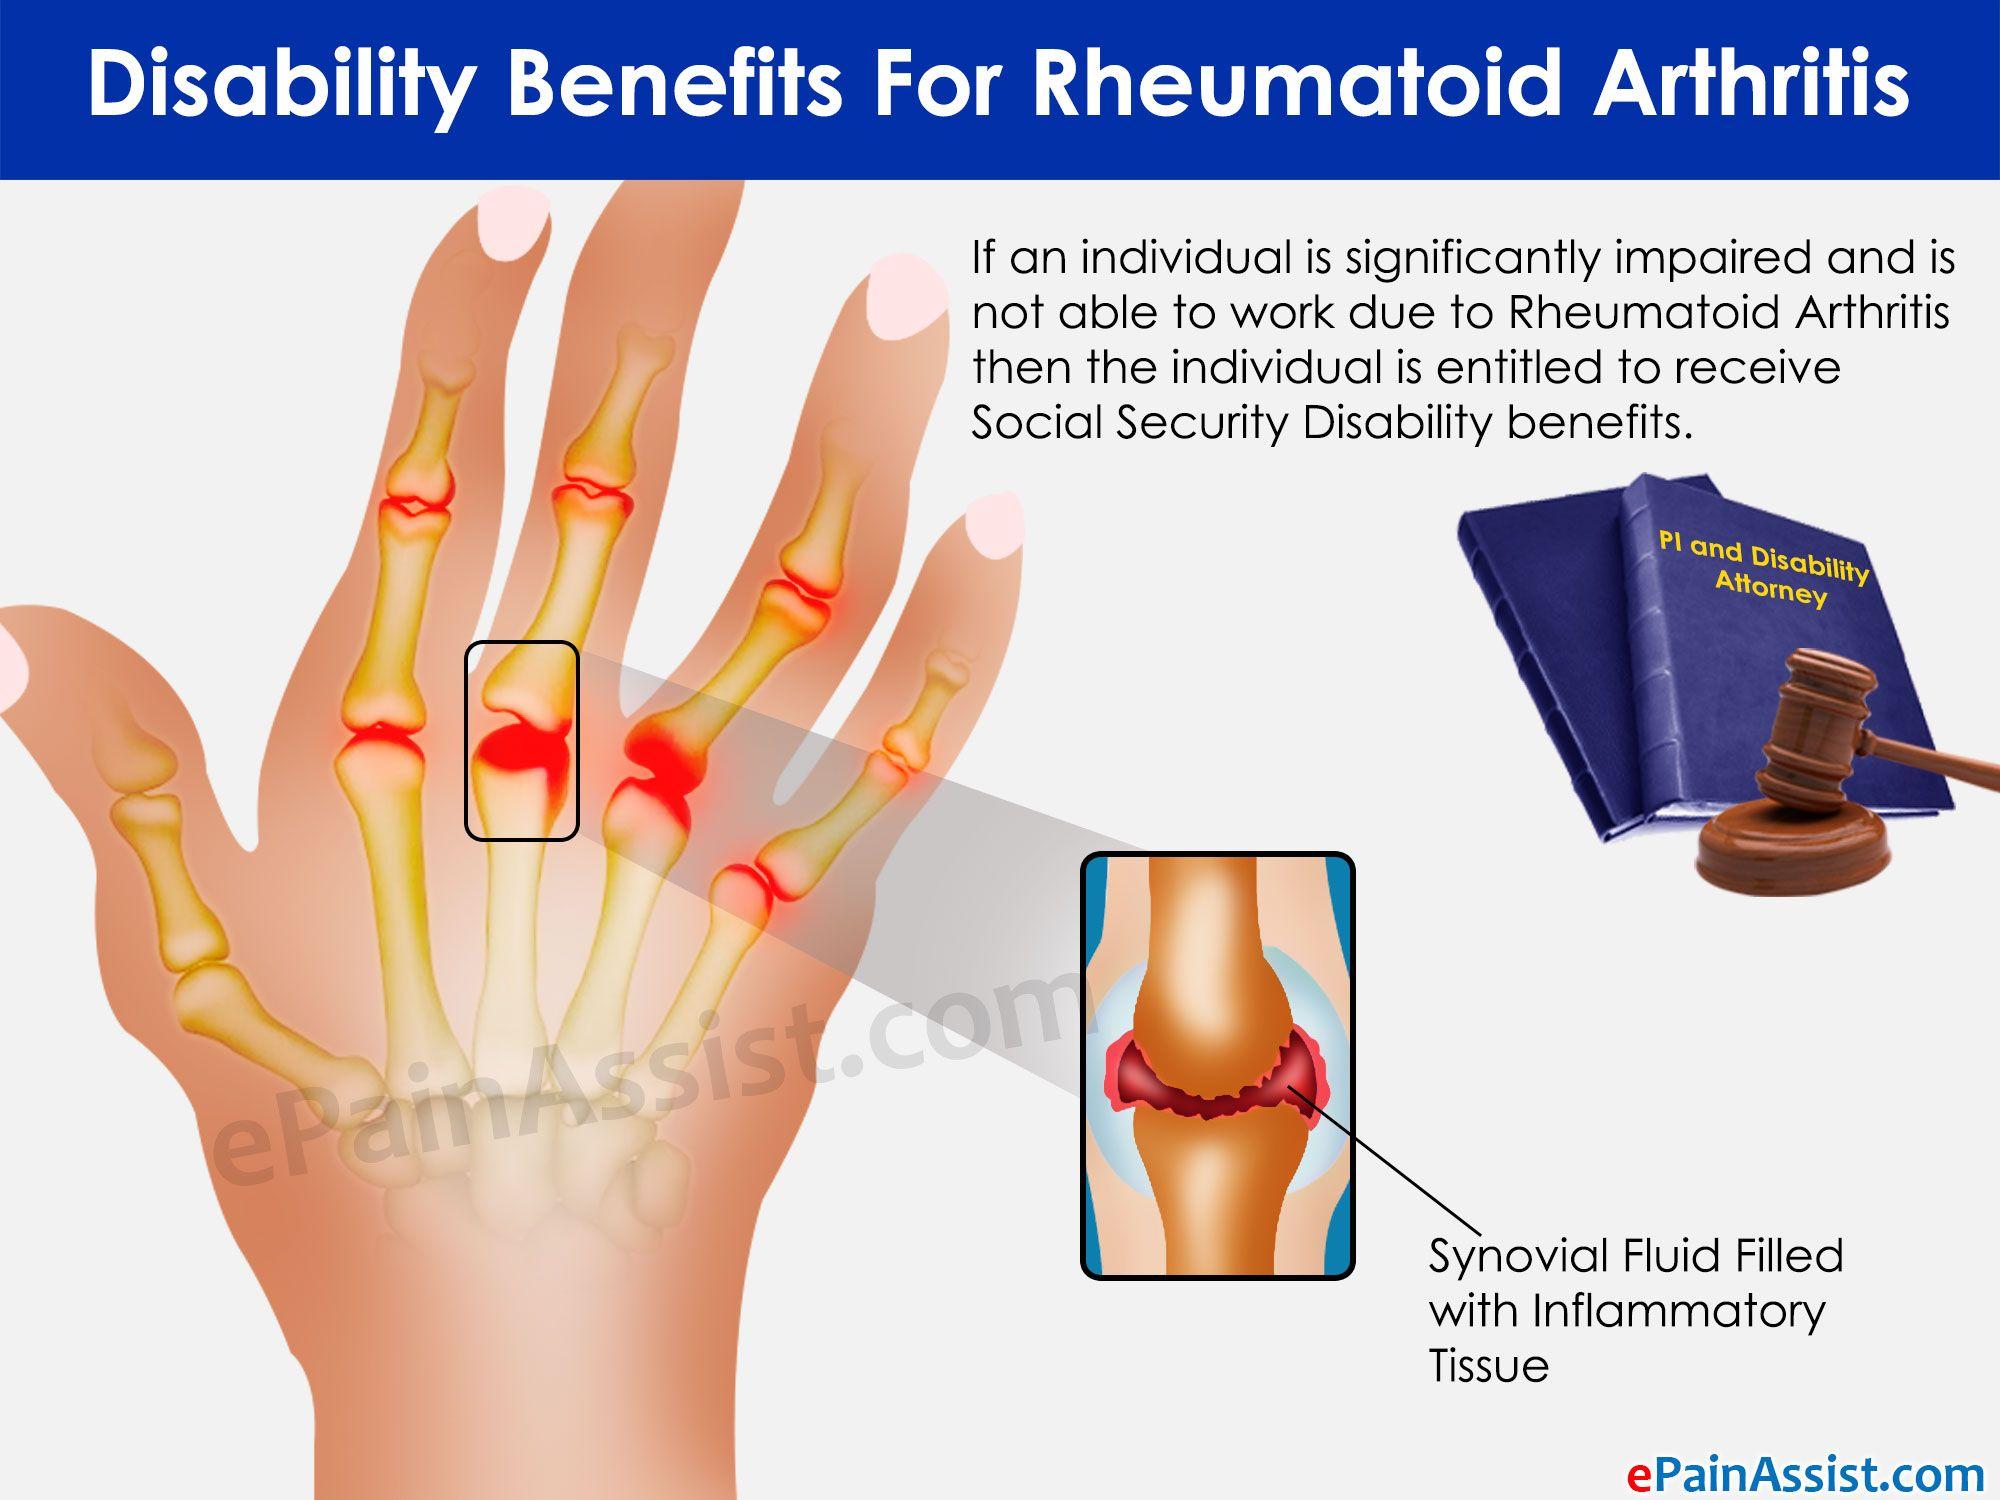 Disability Benefits For Rheumatoid Arthritis Rheumatoid Arthritis Arthritis Disability Benefit